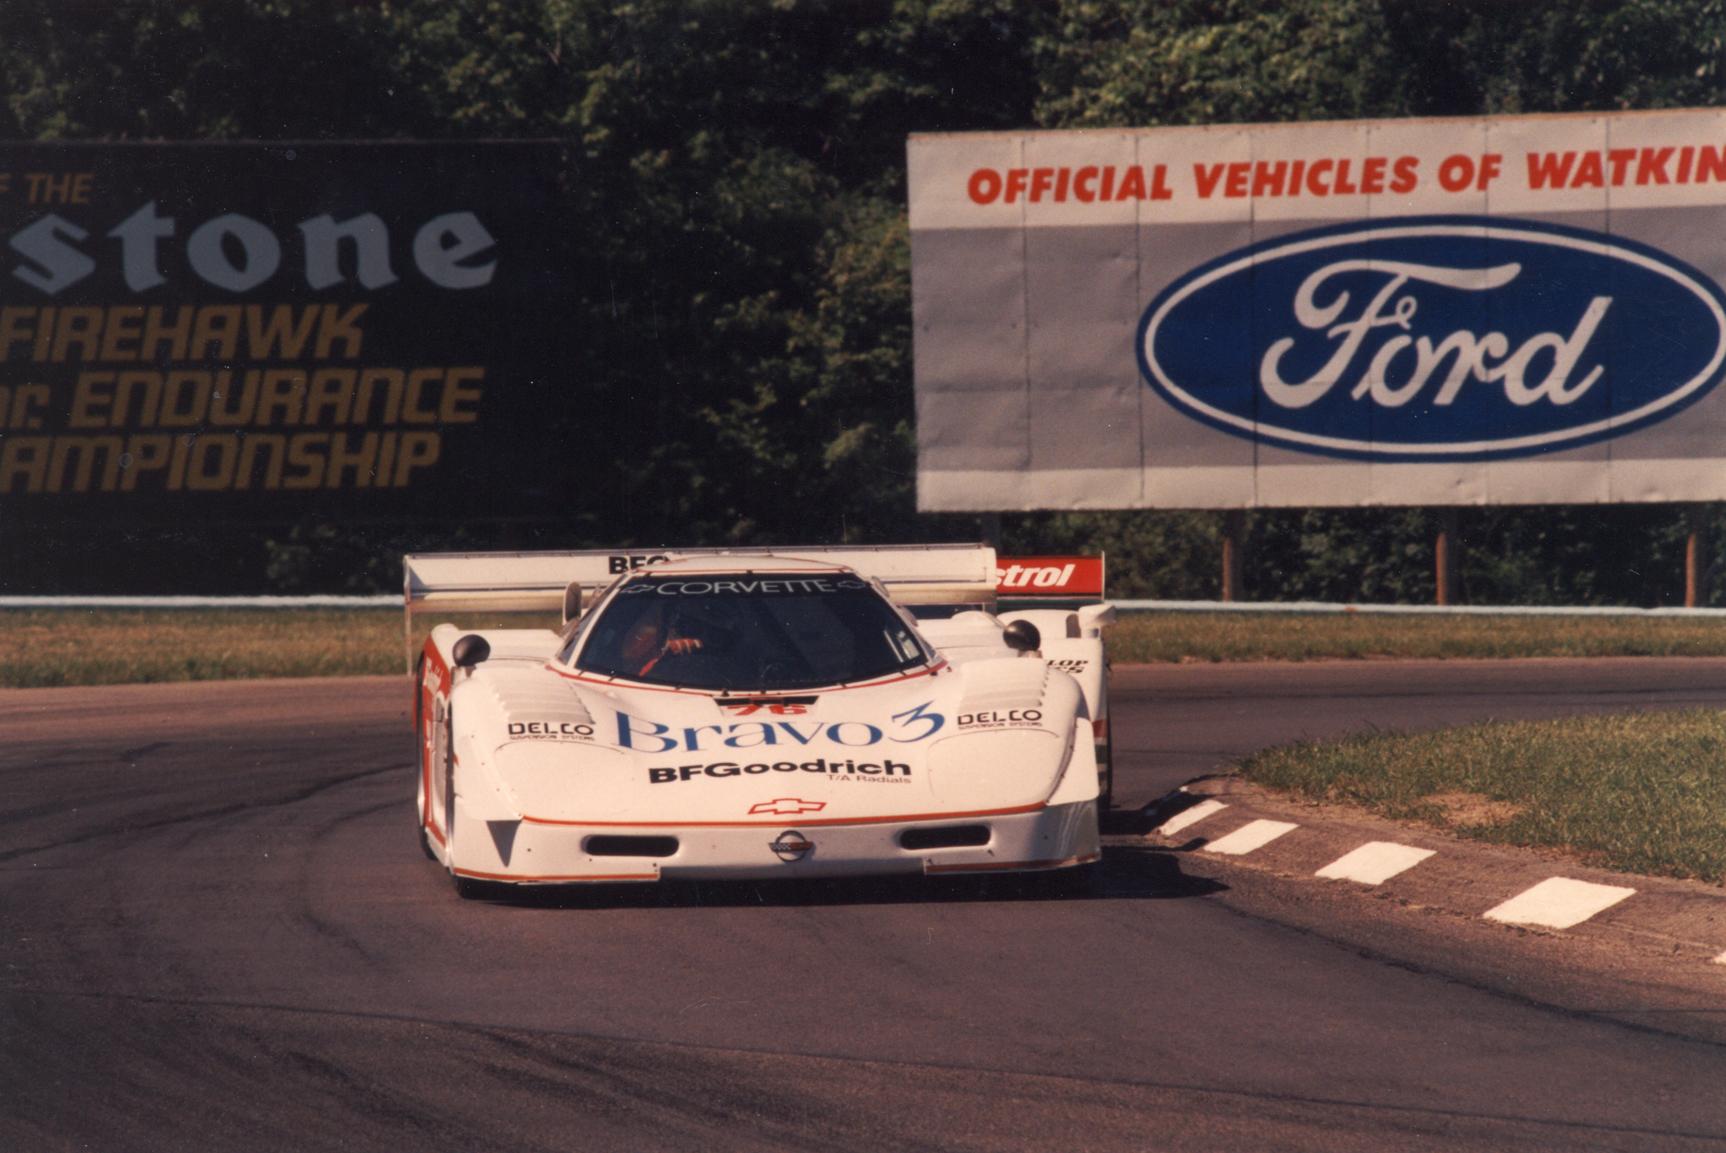 Peerless Racing Corvette GTP battling a Jaguar XJR-9, 1988.